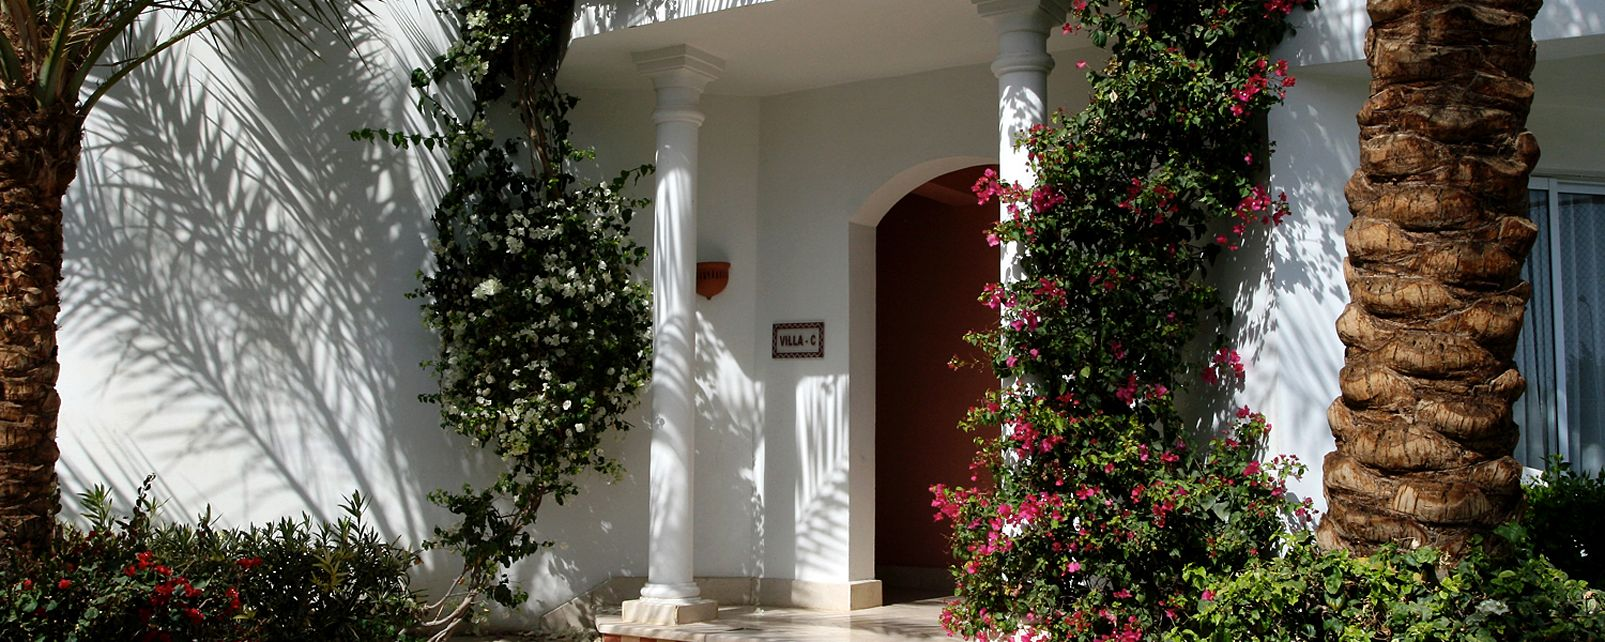 Hôtel Iberotel Club Fanara and Fanara Residence